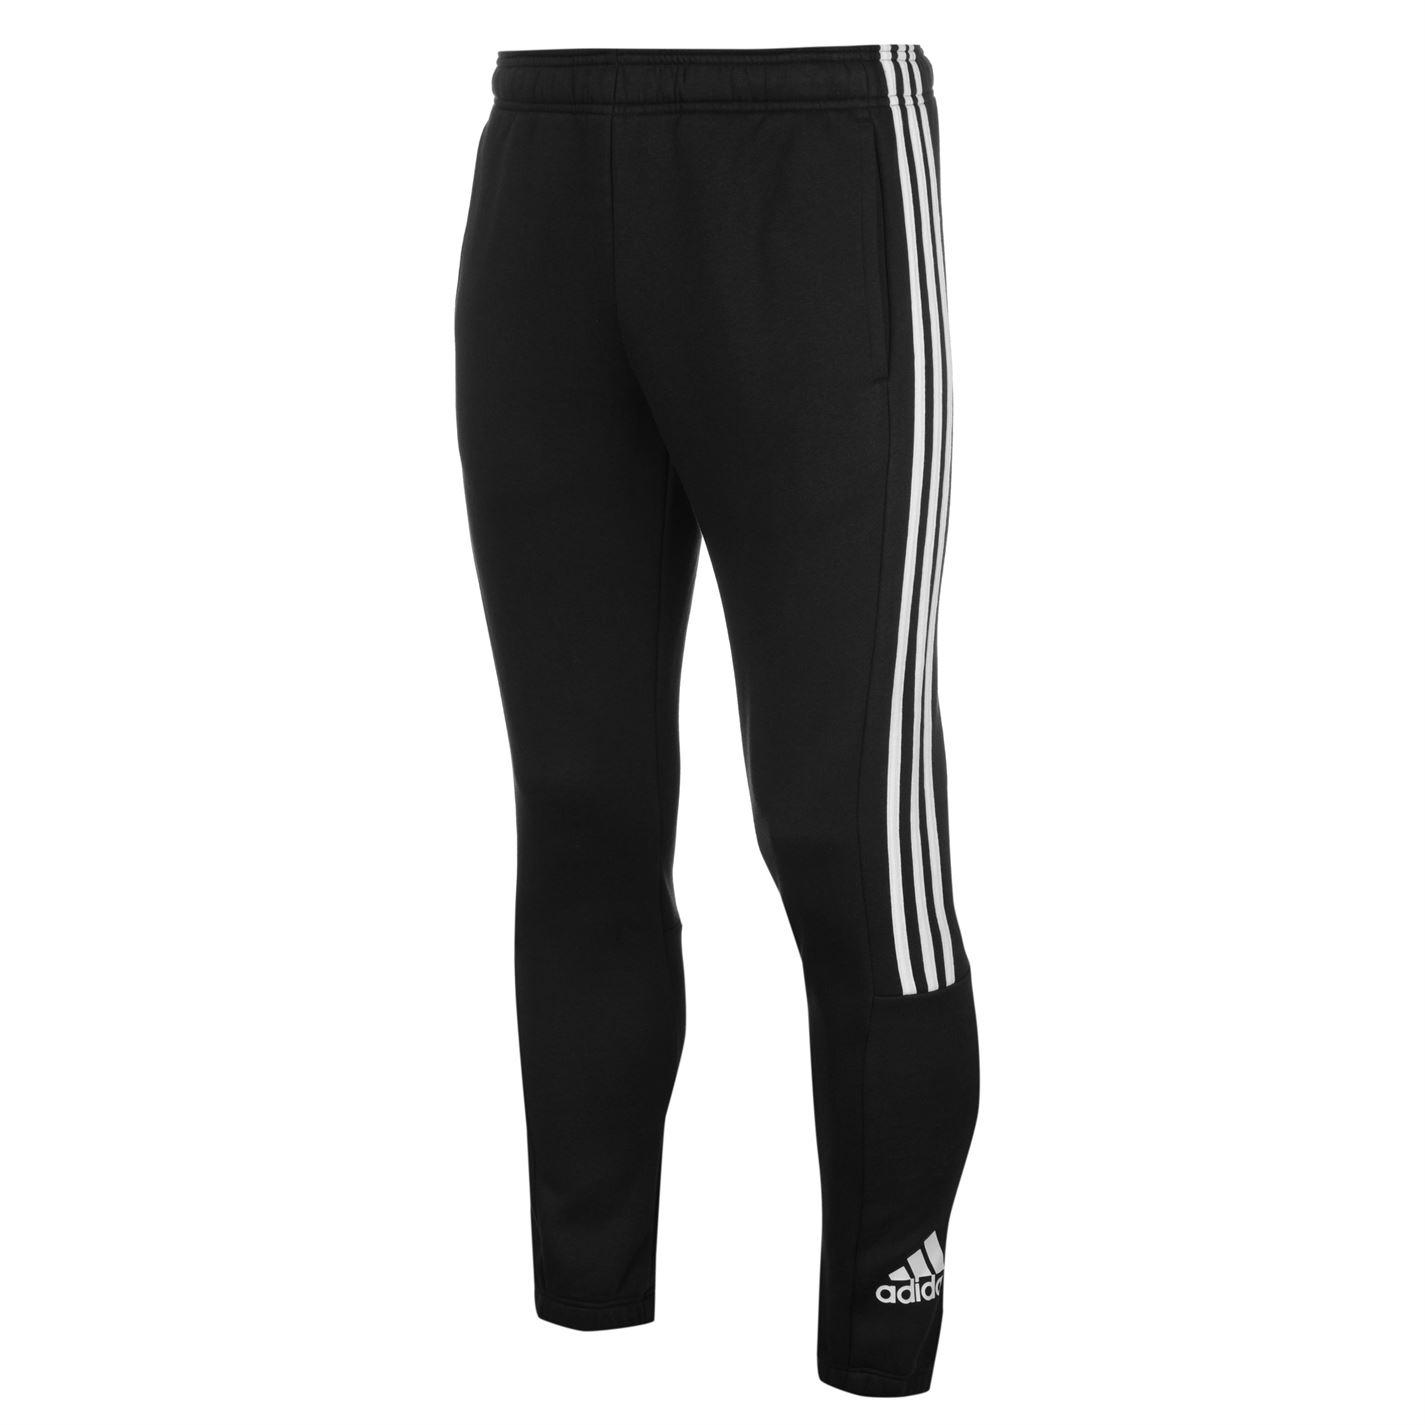 Tepláky pánské Adidas 3 Stripe Sweat Black White - Glami.cz 0c743c472dc